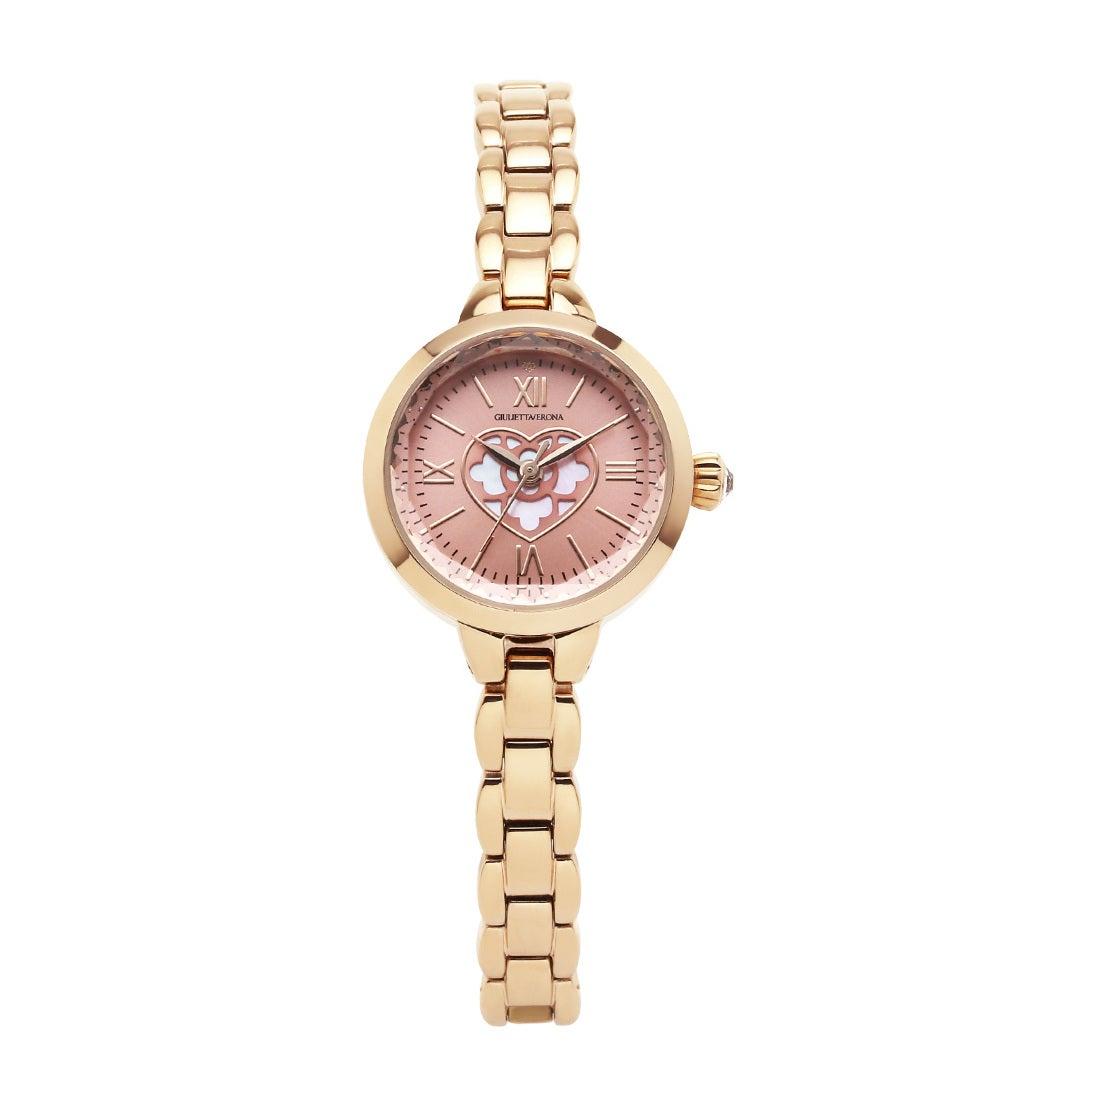 【SAC'S BAR】ジュリエッタヴェローナ GIULIETTAVERONA 腕時計 GV004P PURE GIULIETTA ピンク×ゴールド